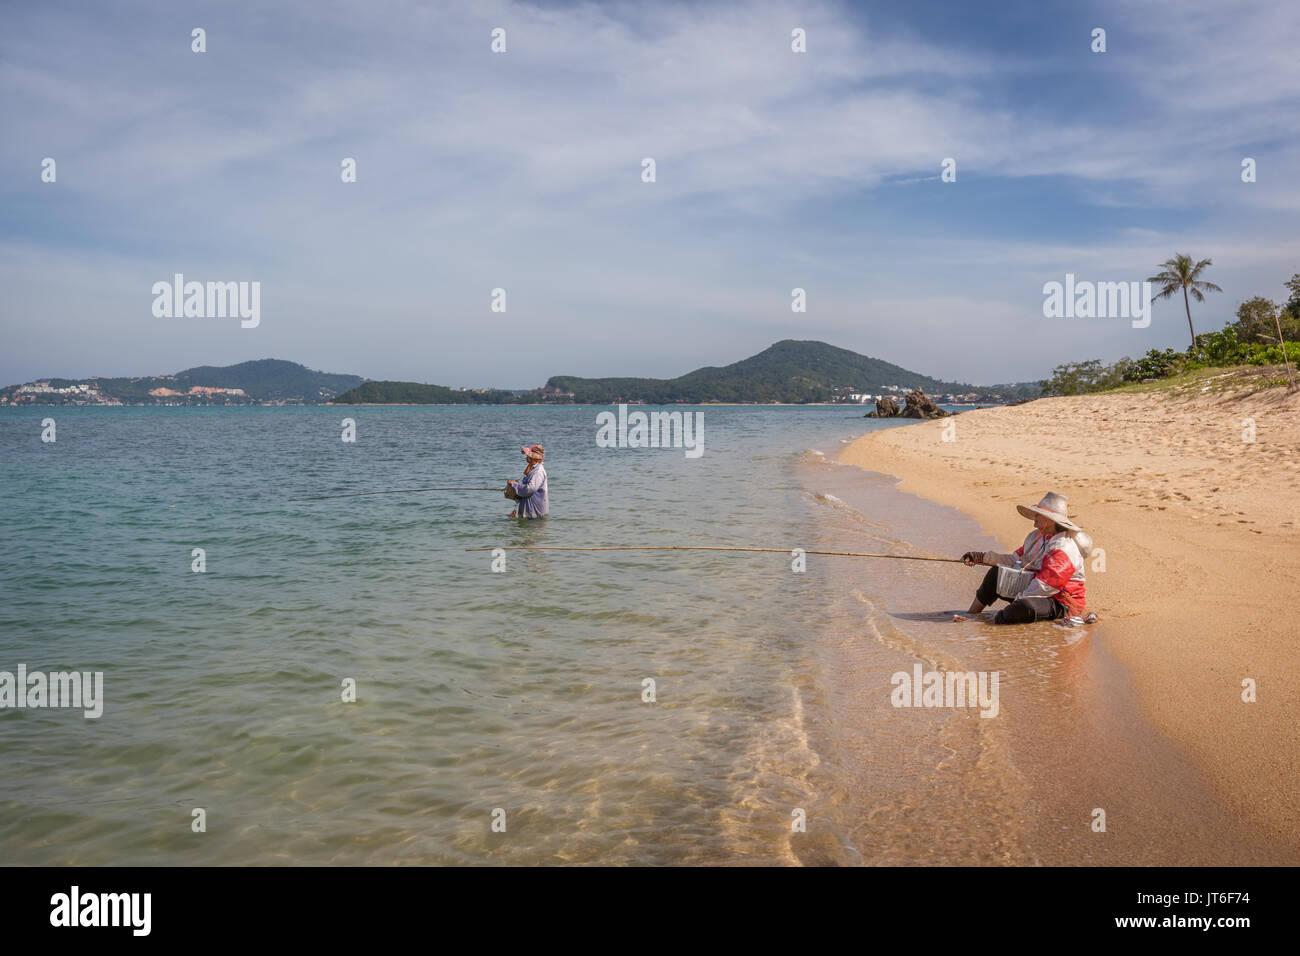 Thai fishermen on the shore of Maenam beach or Ao Menam, Hat Mae Nam, Koh Samui, Thailand - Stock Image